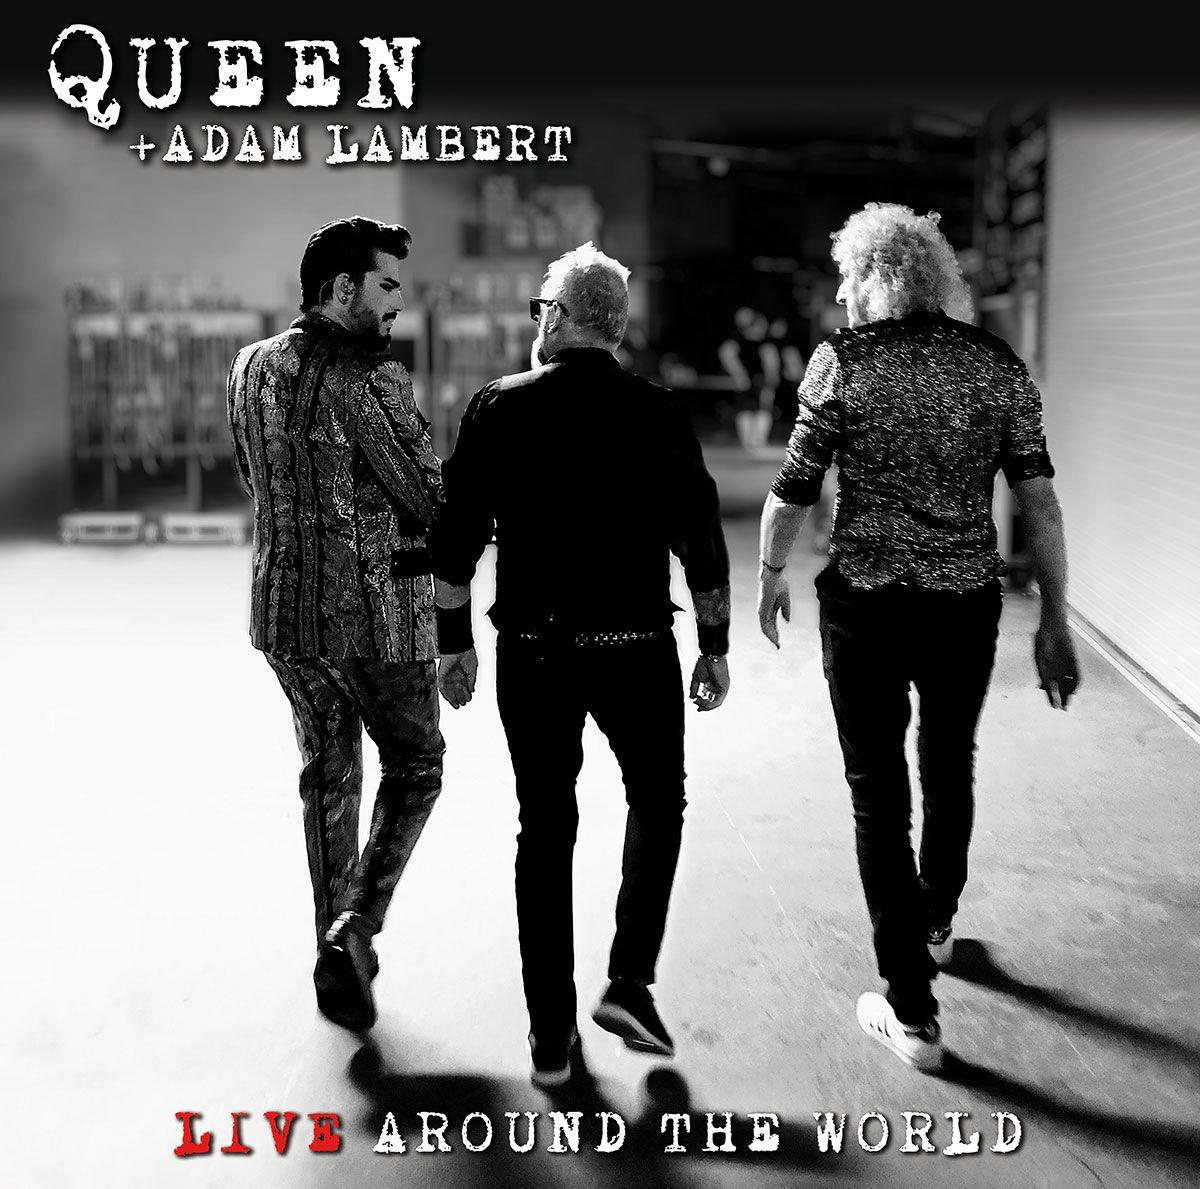 queen adam lambert around the world